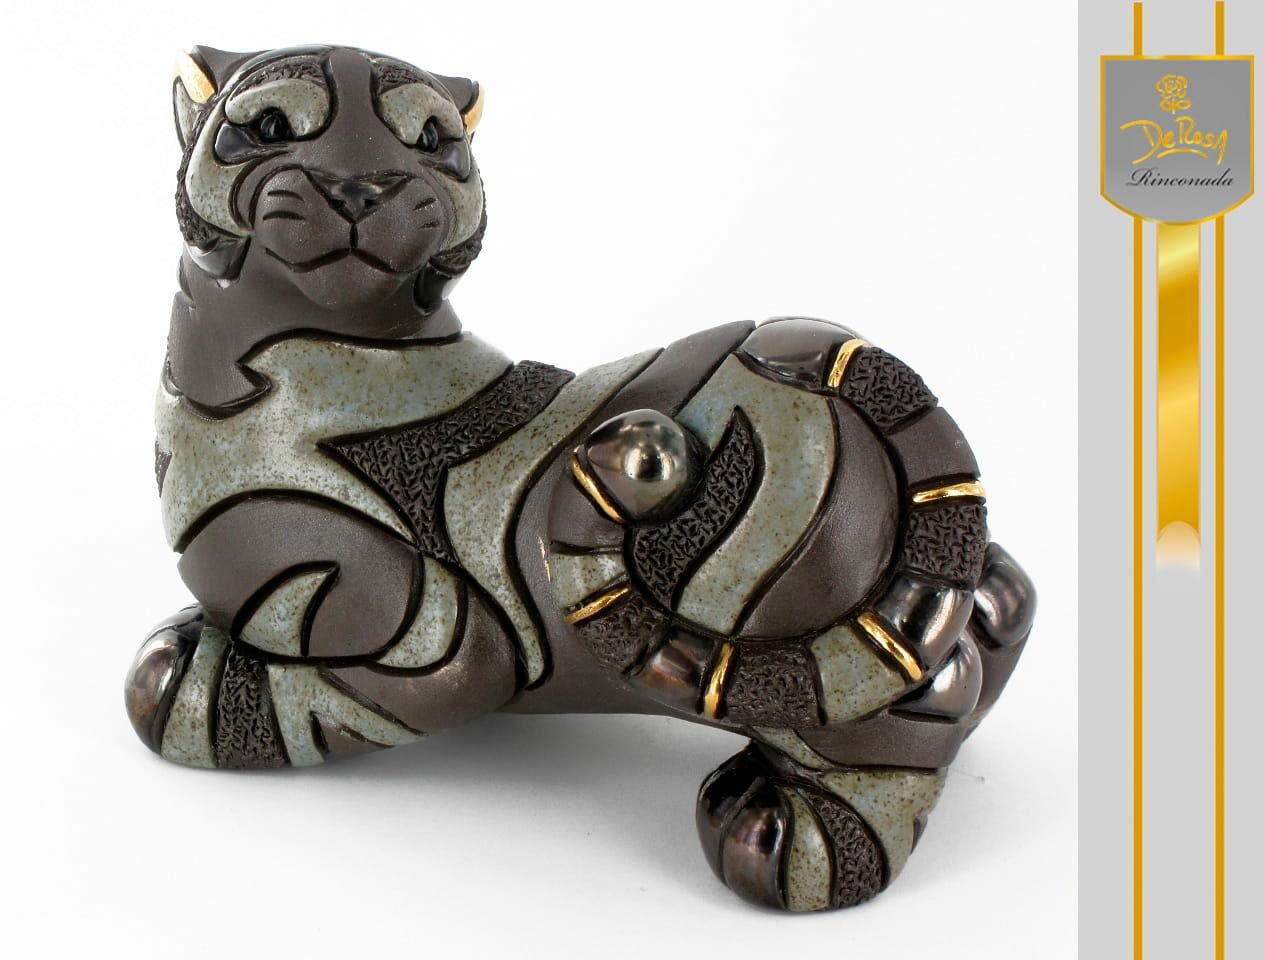 De Rosa Rinconada, figurka Tygrys - /KP/